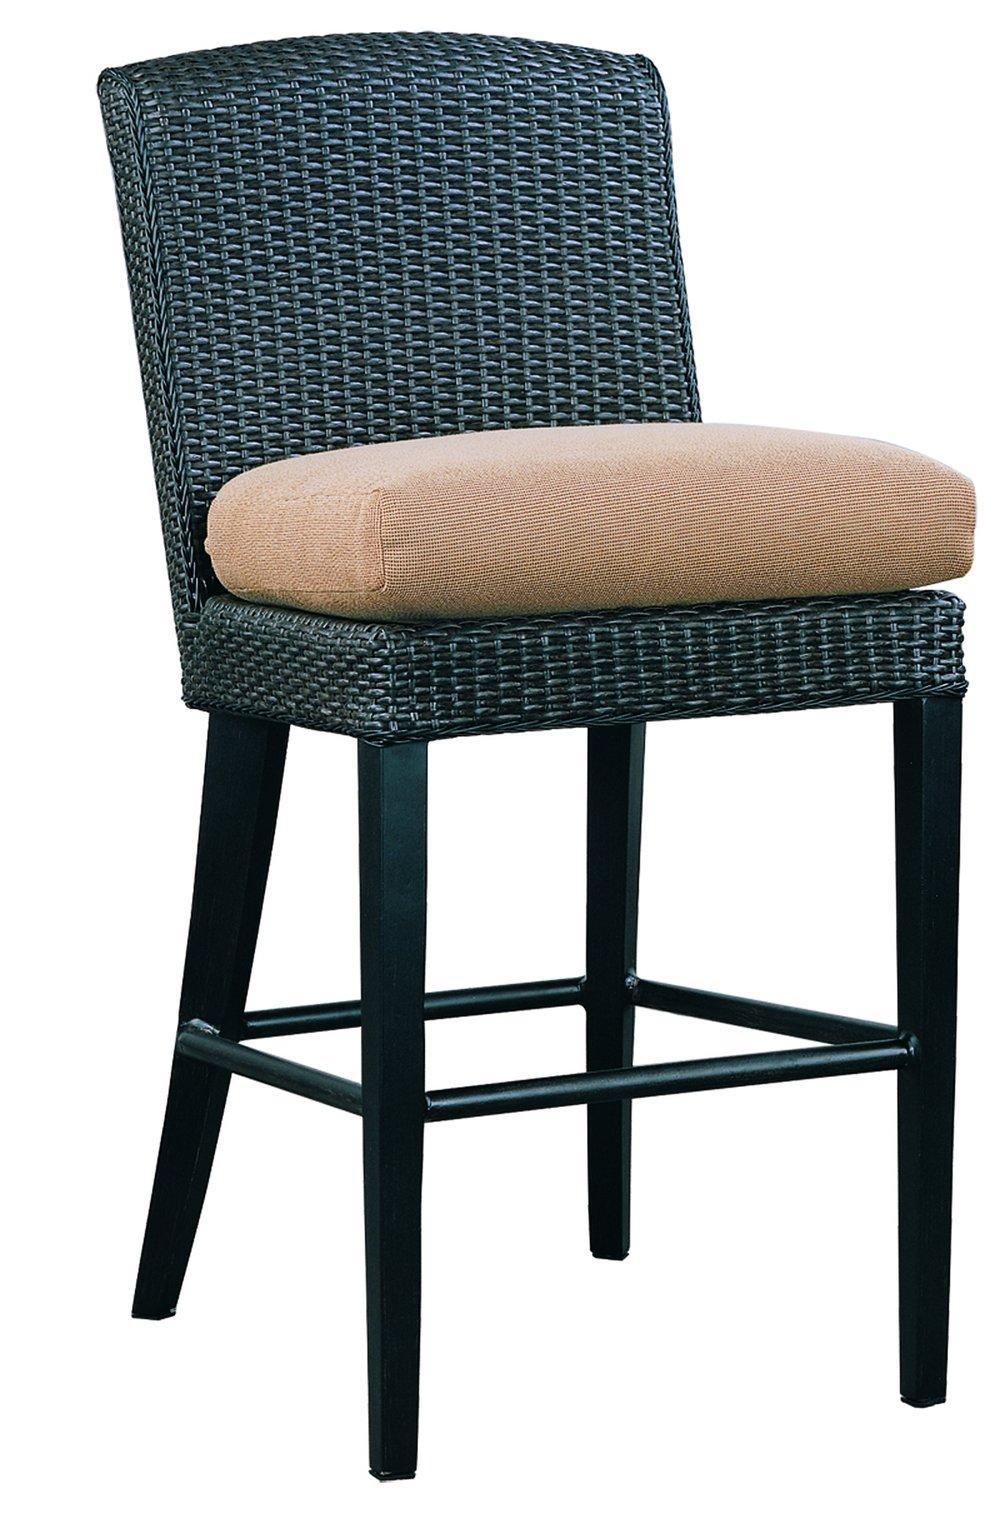 "970112 Monterey Bar Chair   21.5"" x 27.2"" x 44.7"""